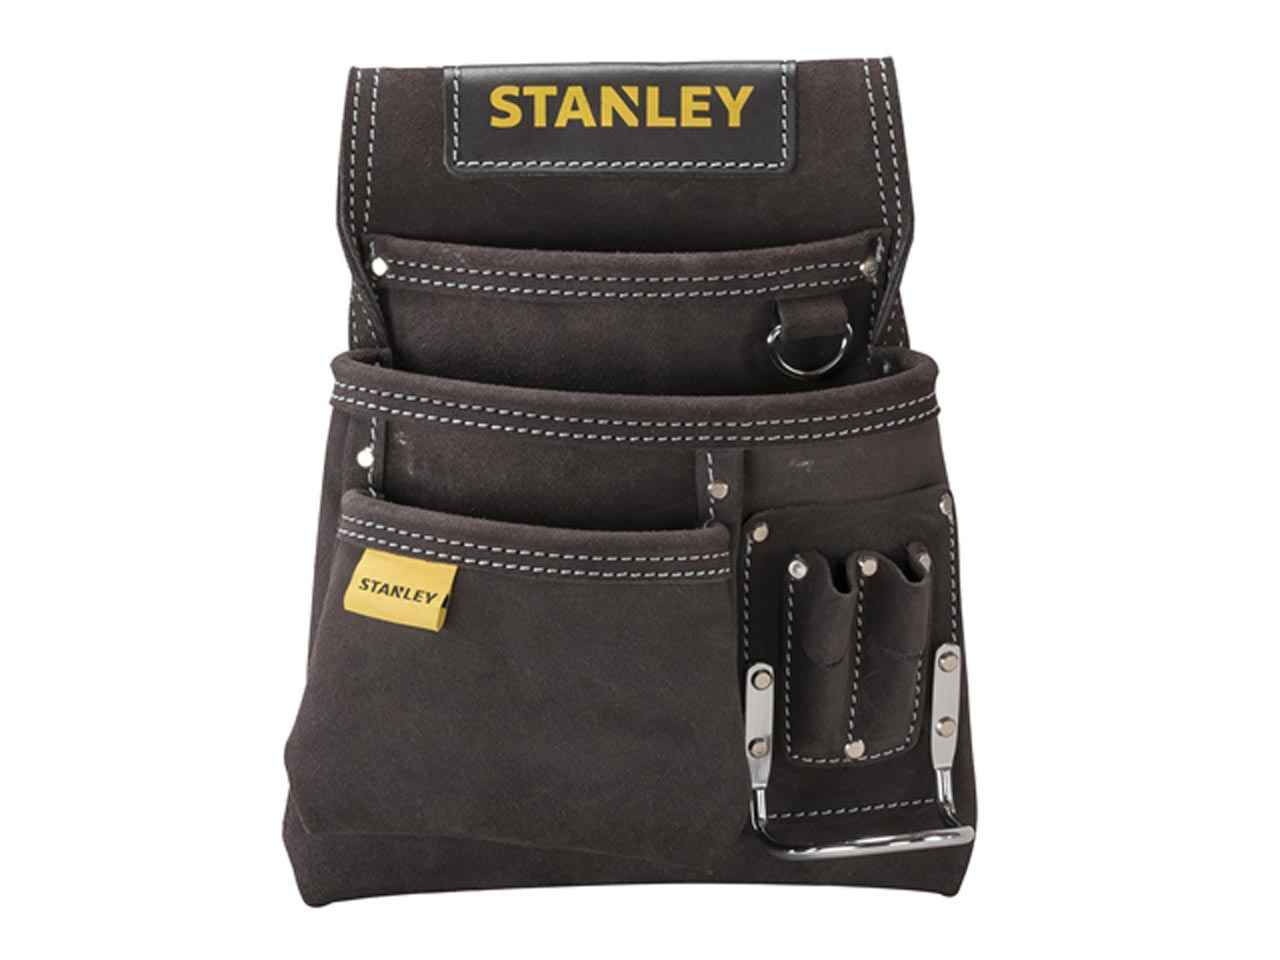 Stanley STST1-80114 Cuero Clavo   Martillo Bolsa  666bbcbd216d